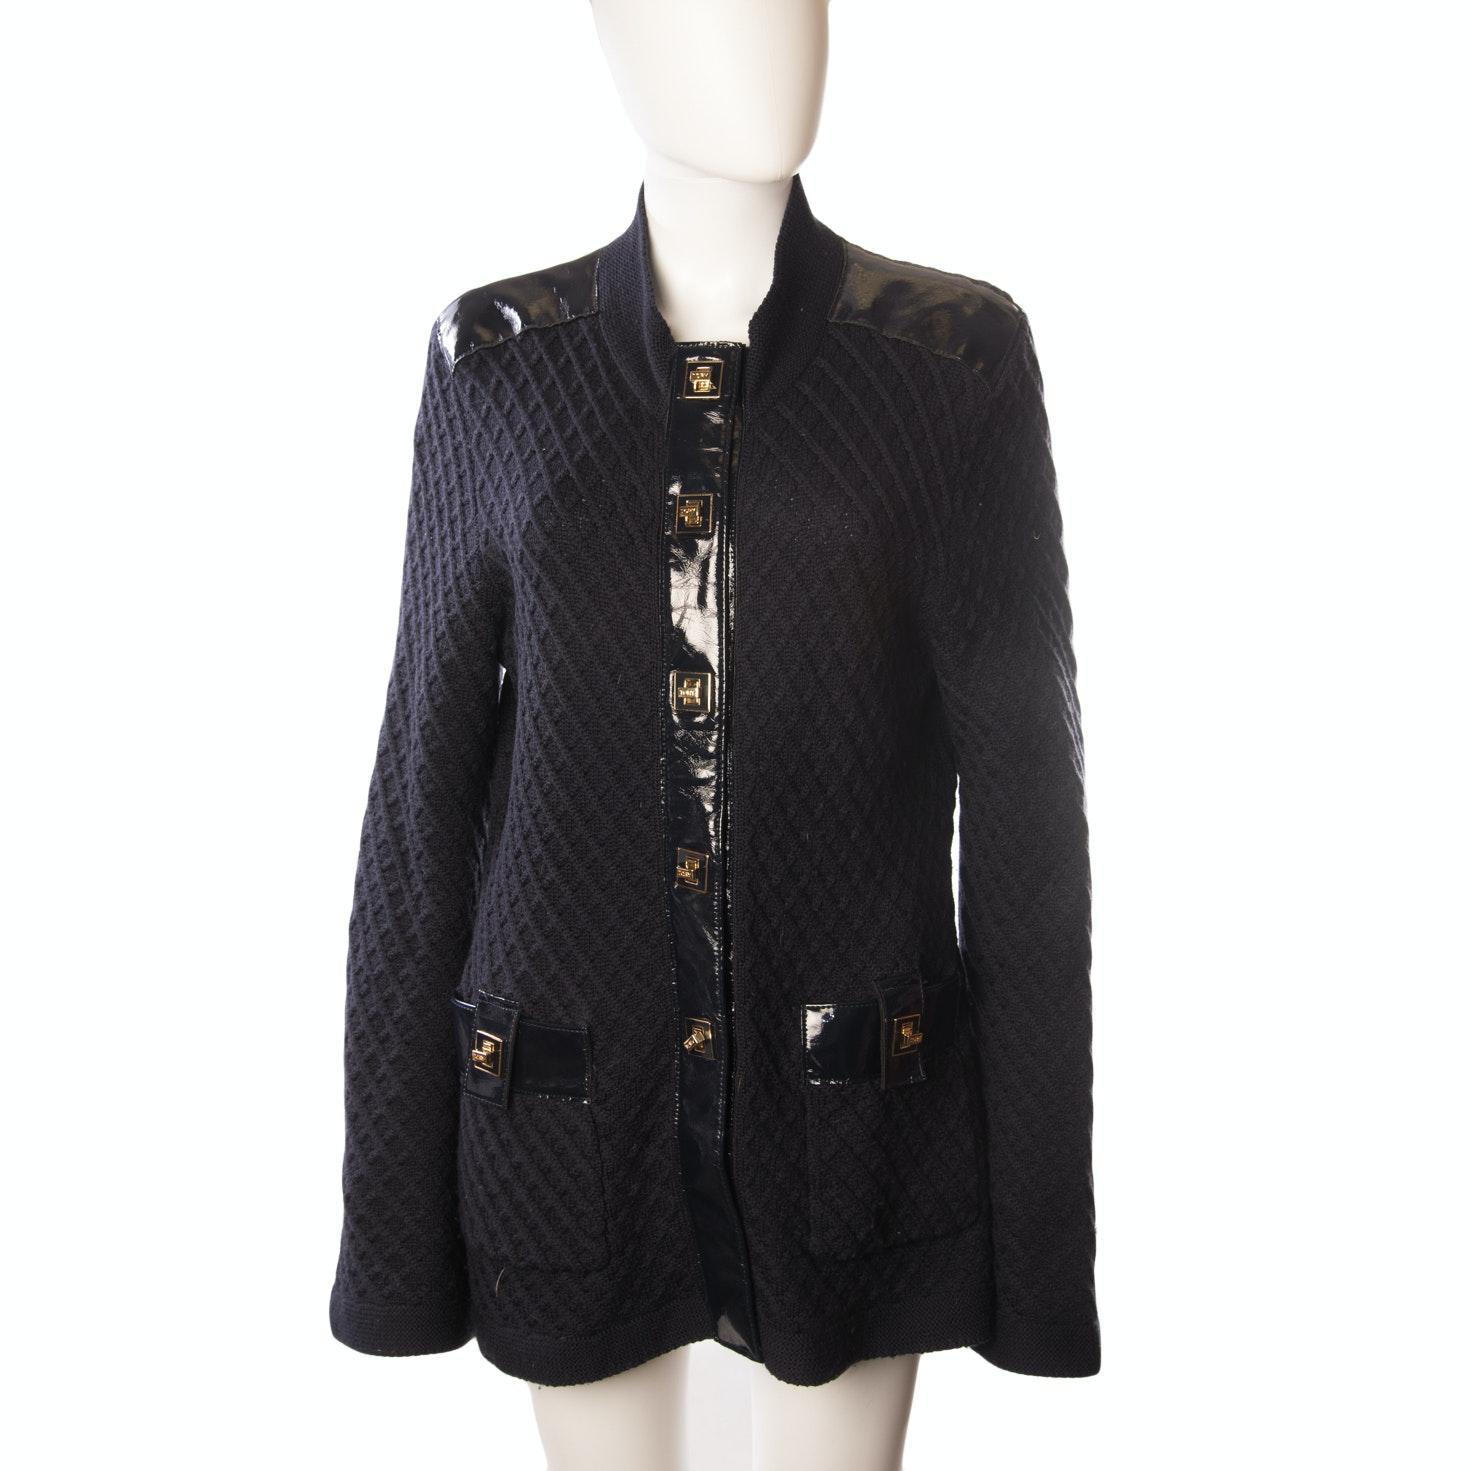 Tory Burch Black Knit Wool Cardigan